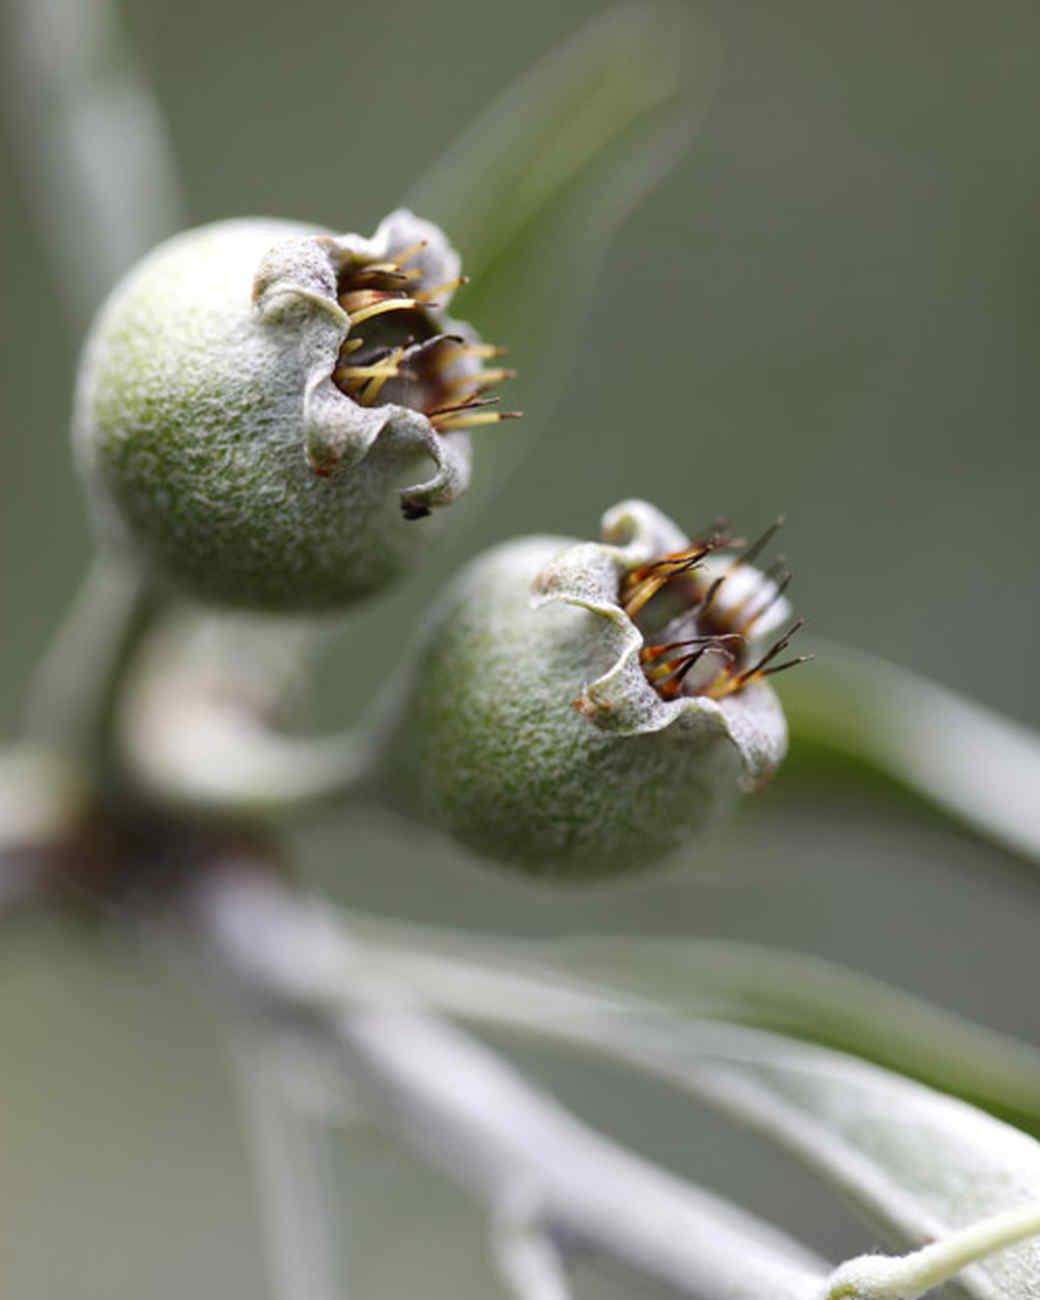 ms_edible_garden_mg_0550_willowleaf_pear_buds.jpg